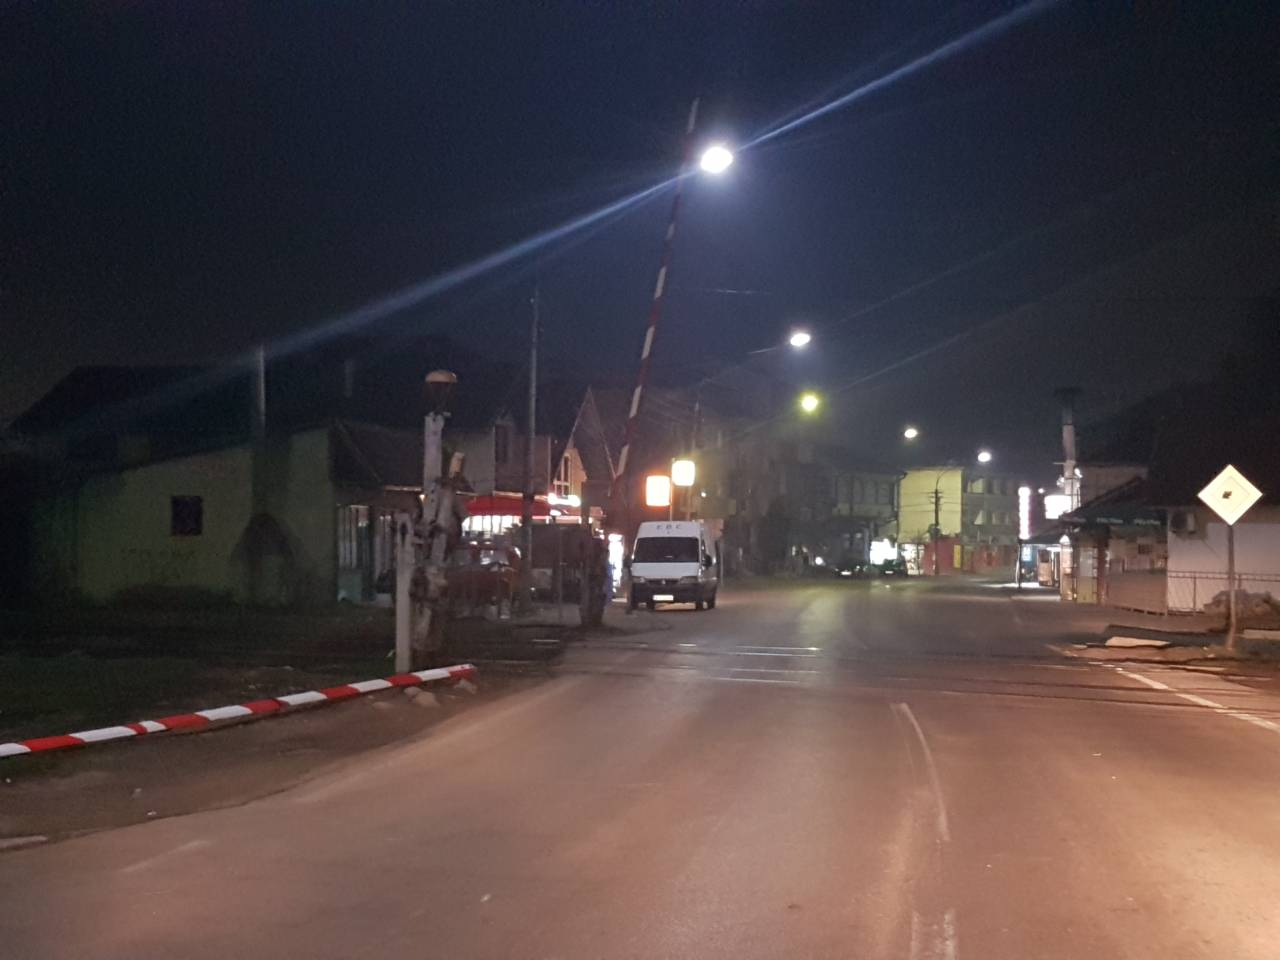 VOZAČI OPREZNO! Polomljena rampa na pružnom prelazu u Svrljigu